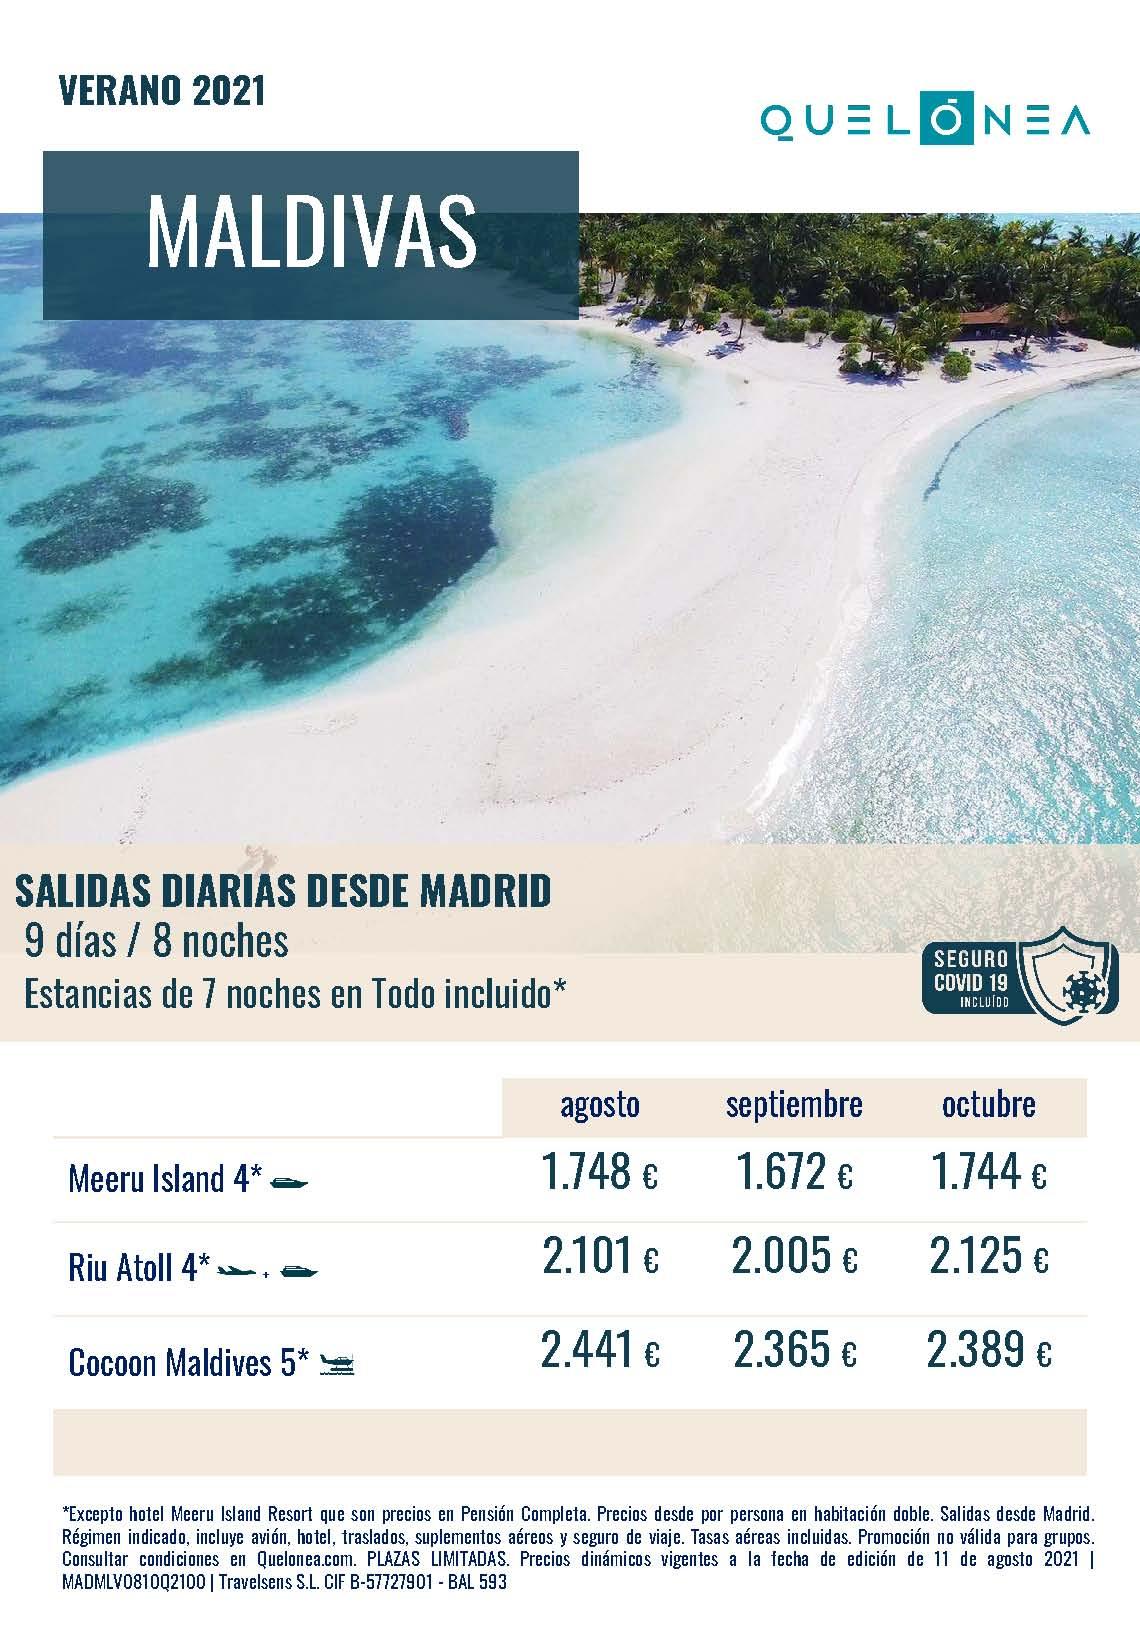 Ofertas Quelonea Maldivas Agosto Septiembre Octubre 2021